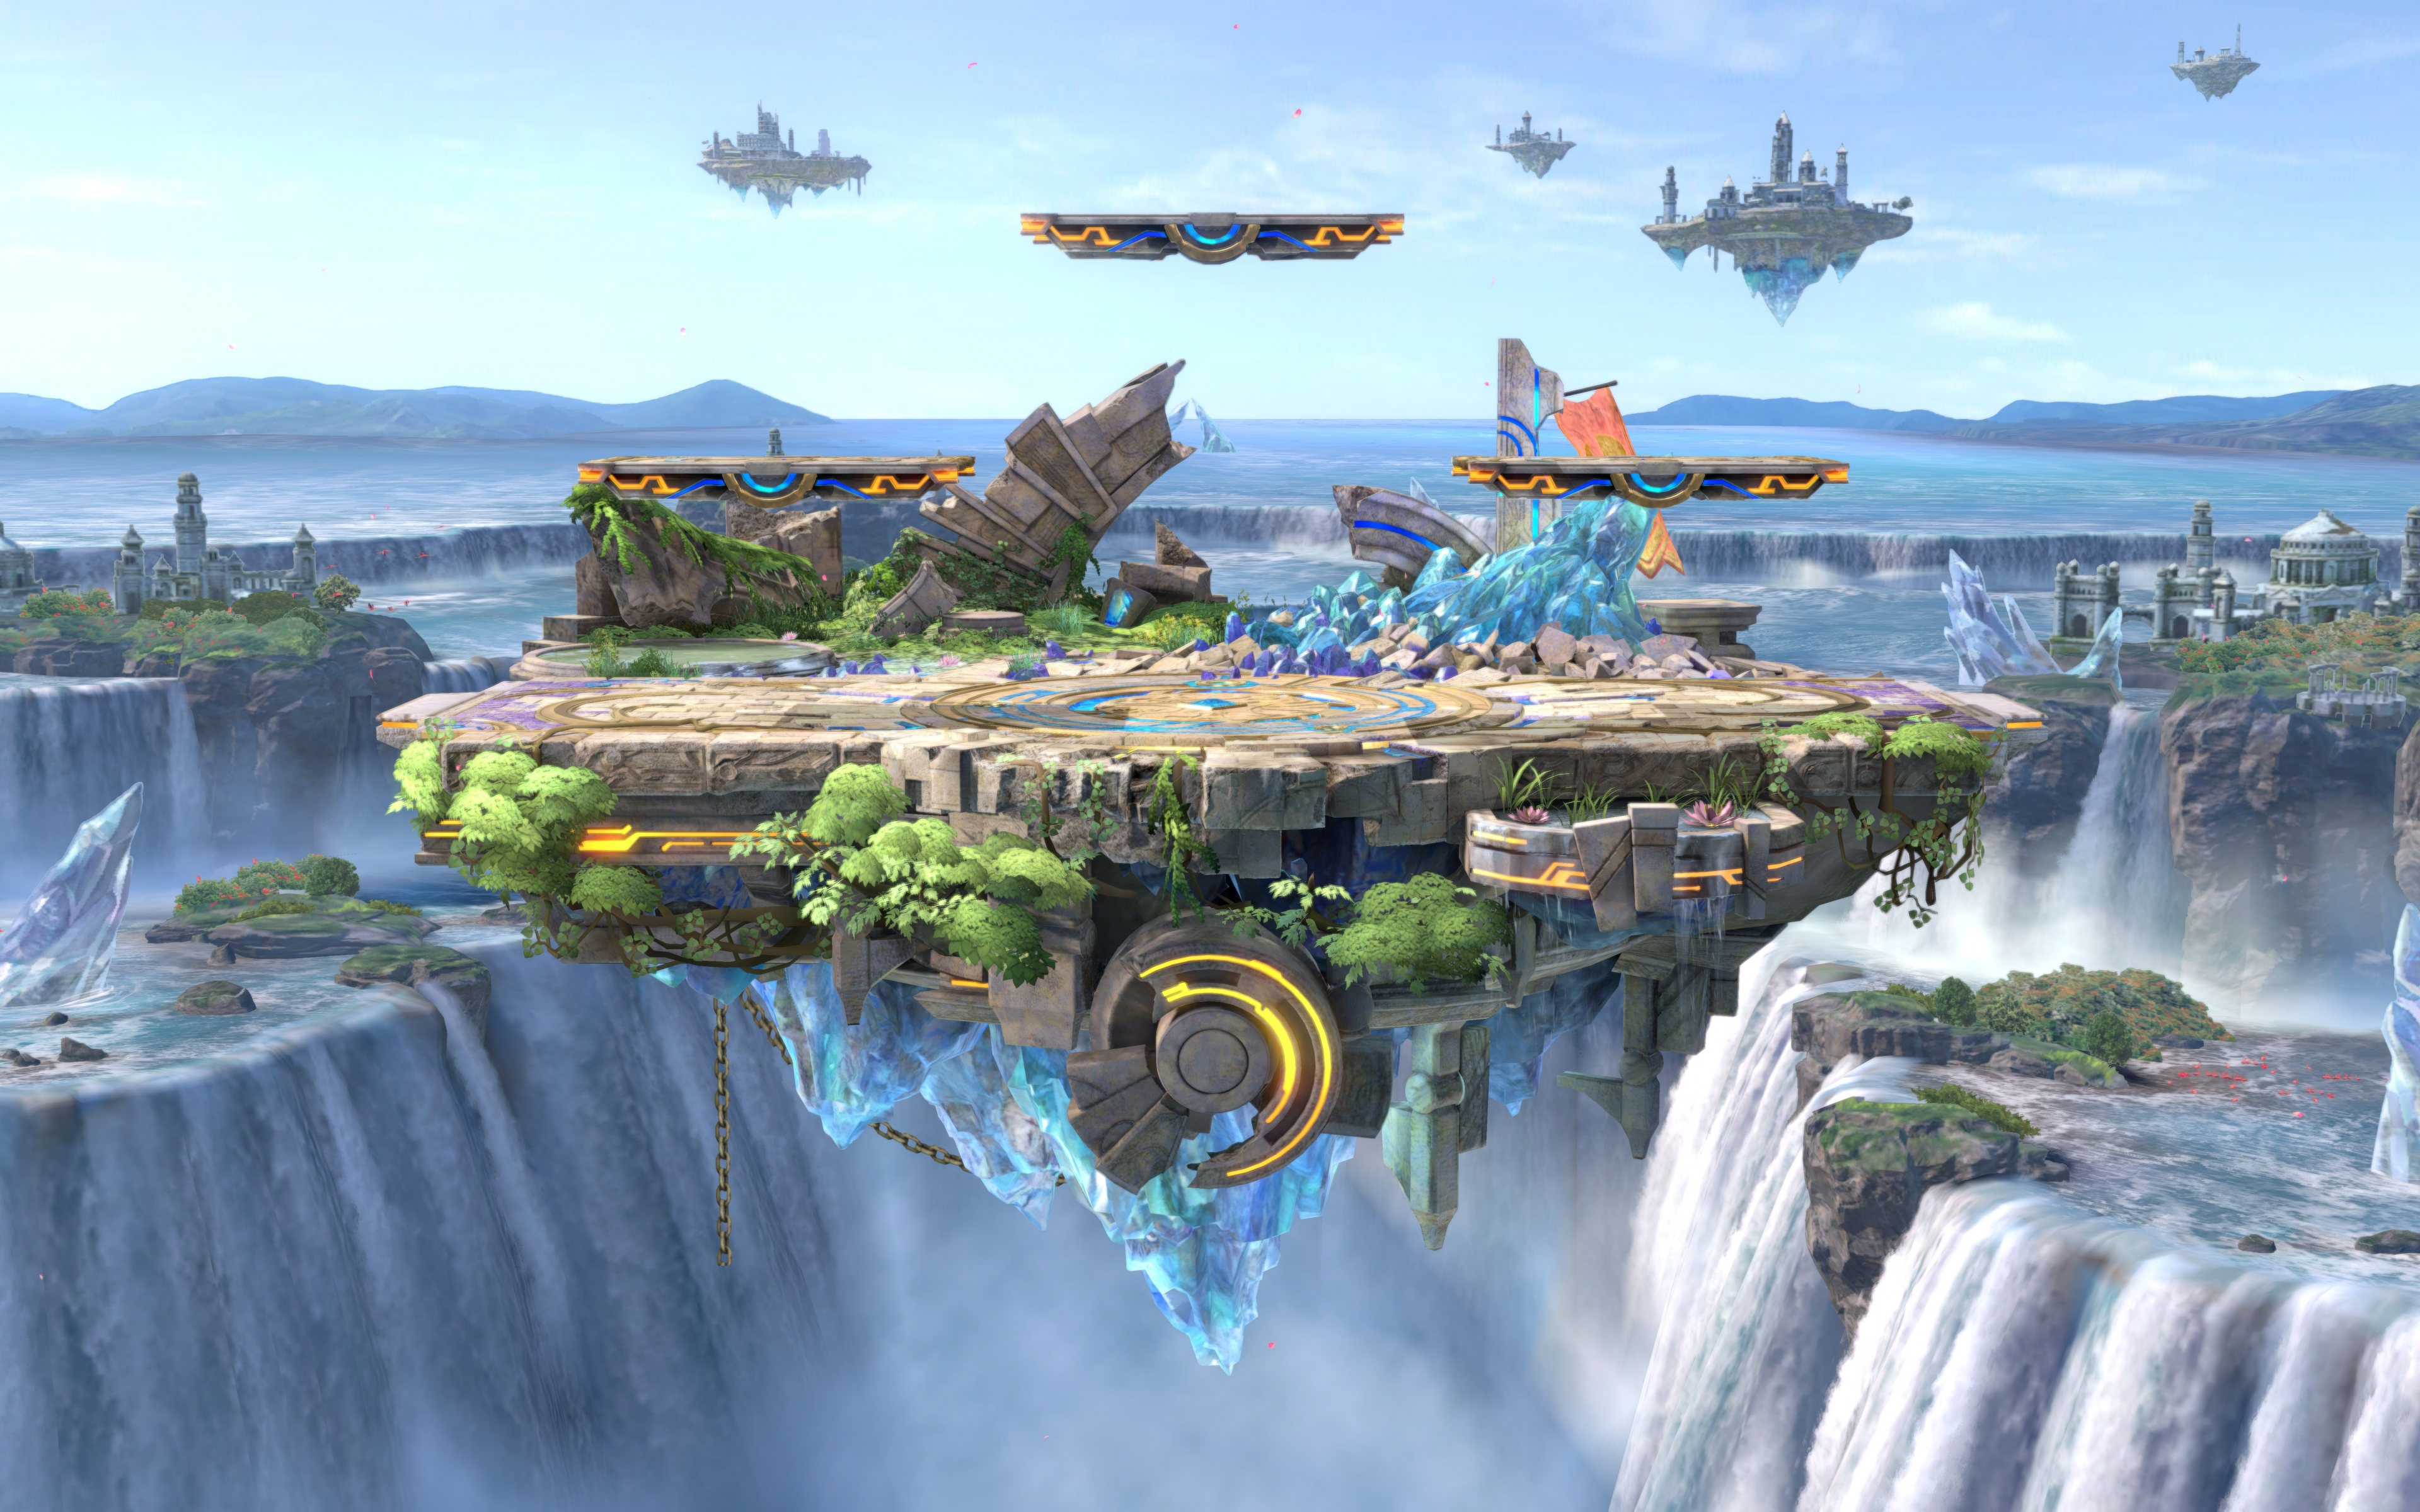 Download 3840x2400 Wallpaper Super Smash Bros Ultimate Video